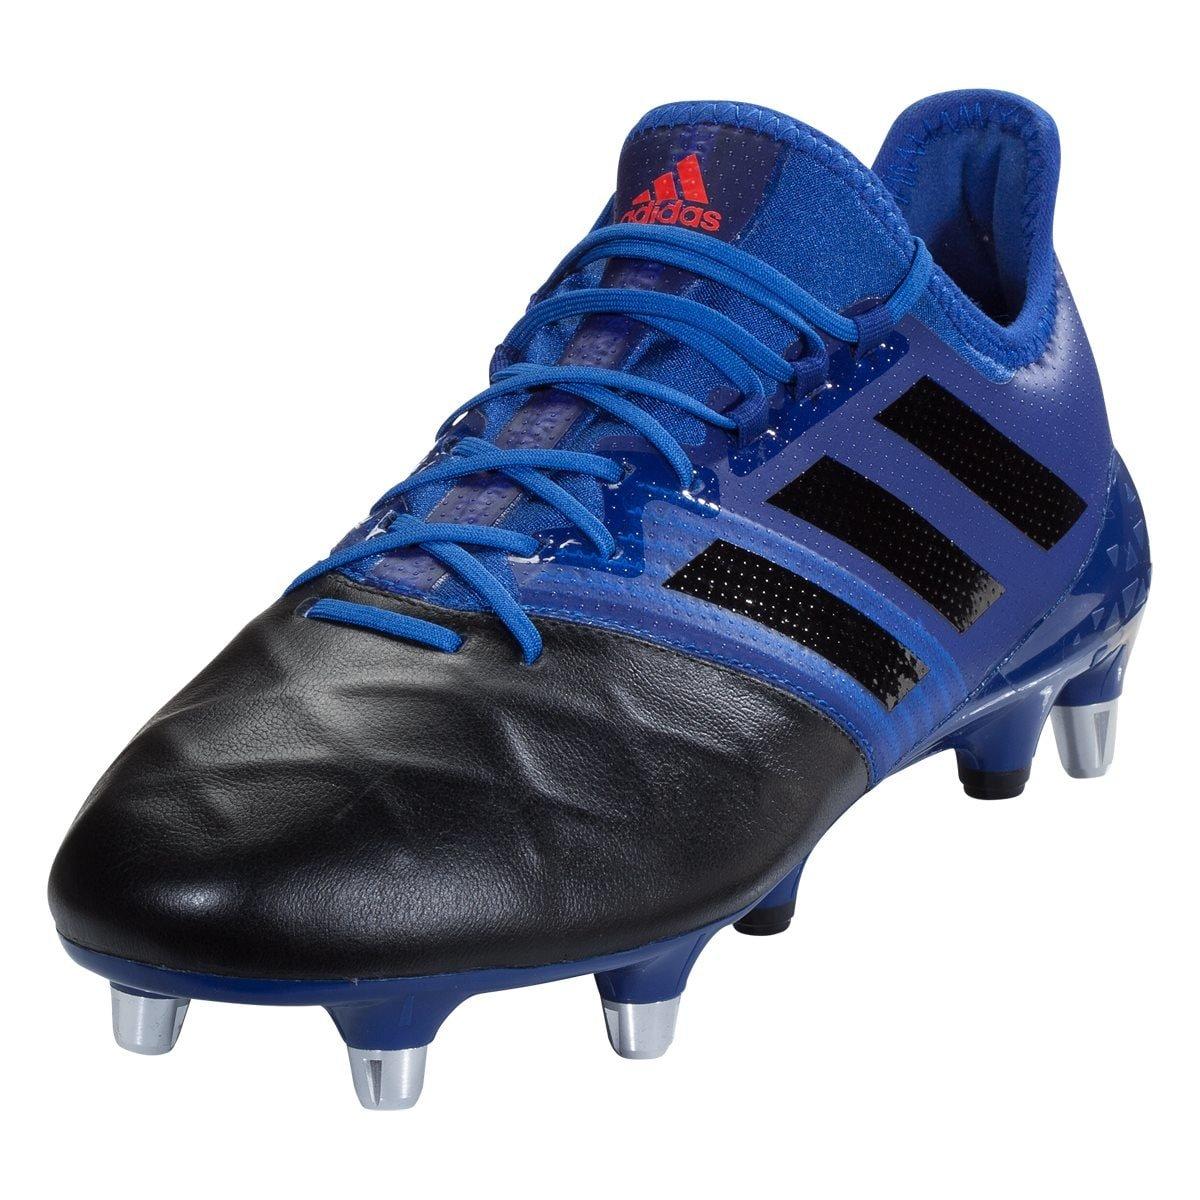 Adidas Kakari Light SG Rugby Boots, Blue, US 9.5